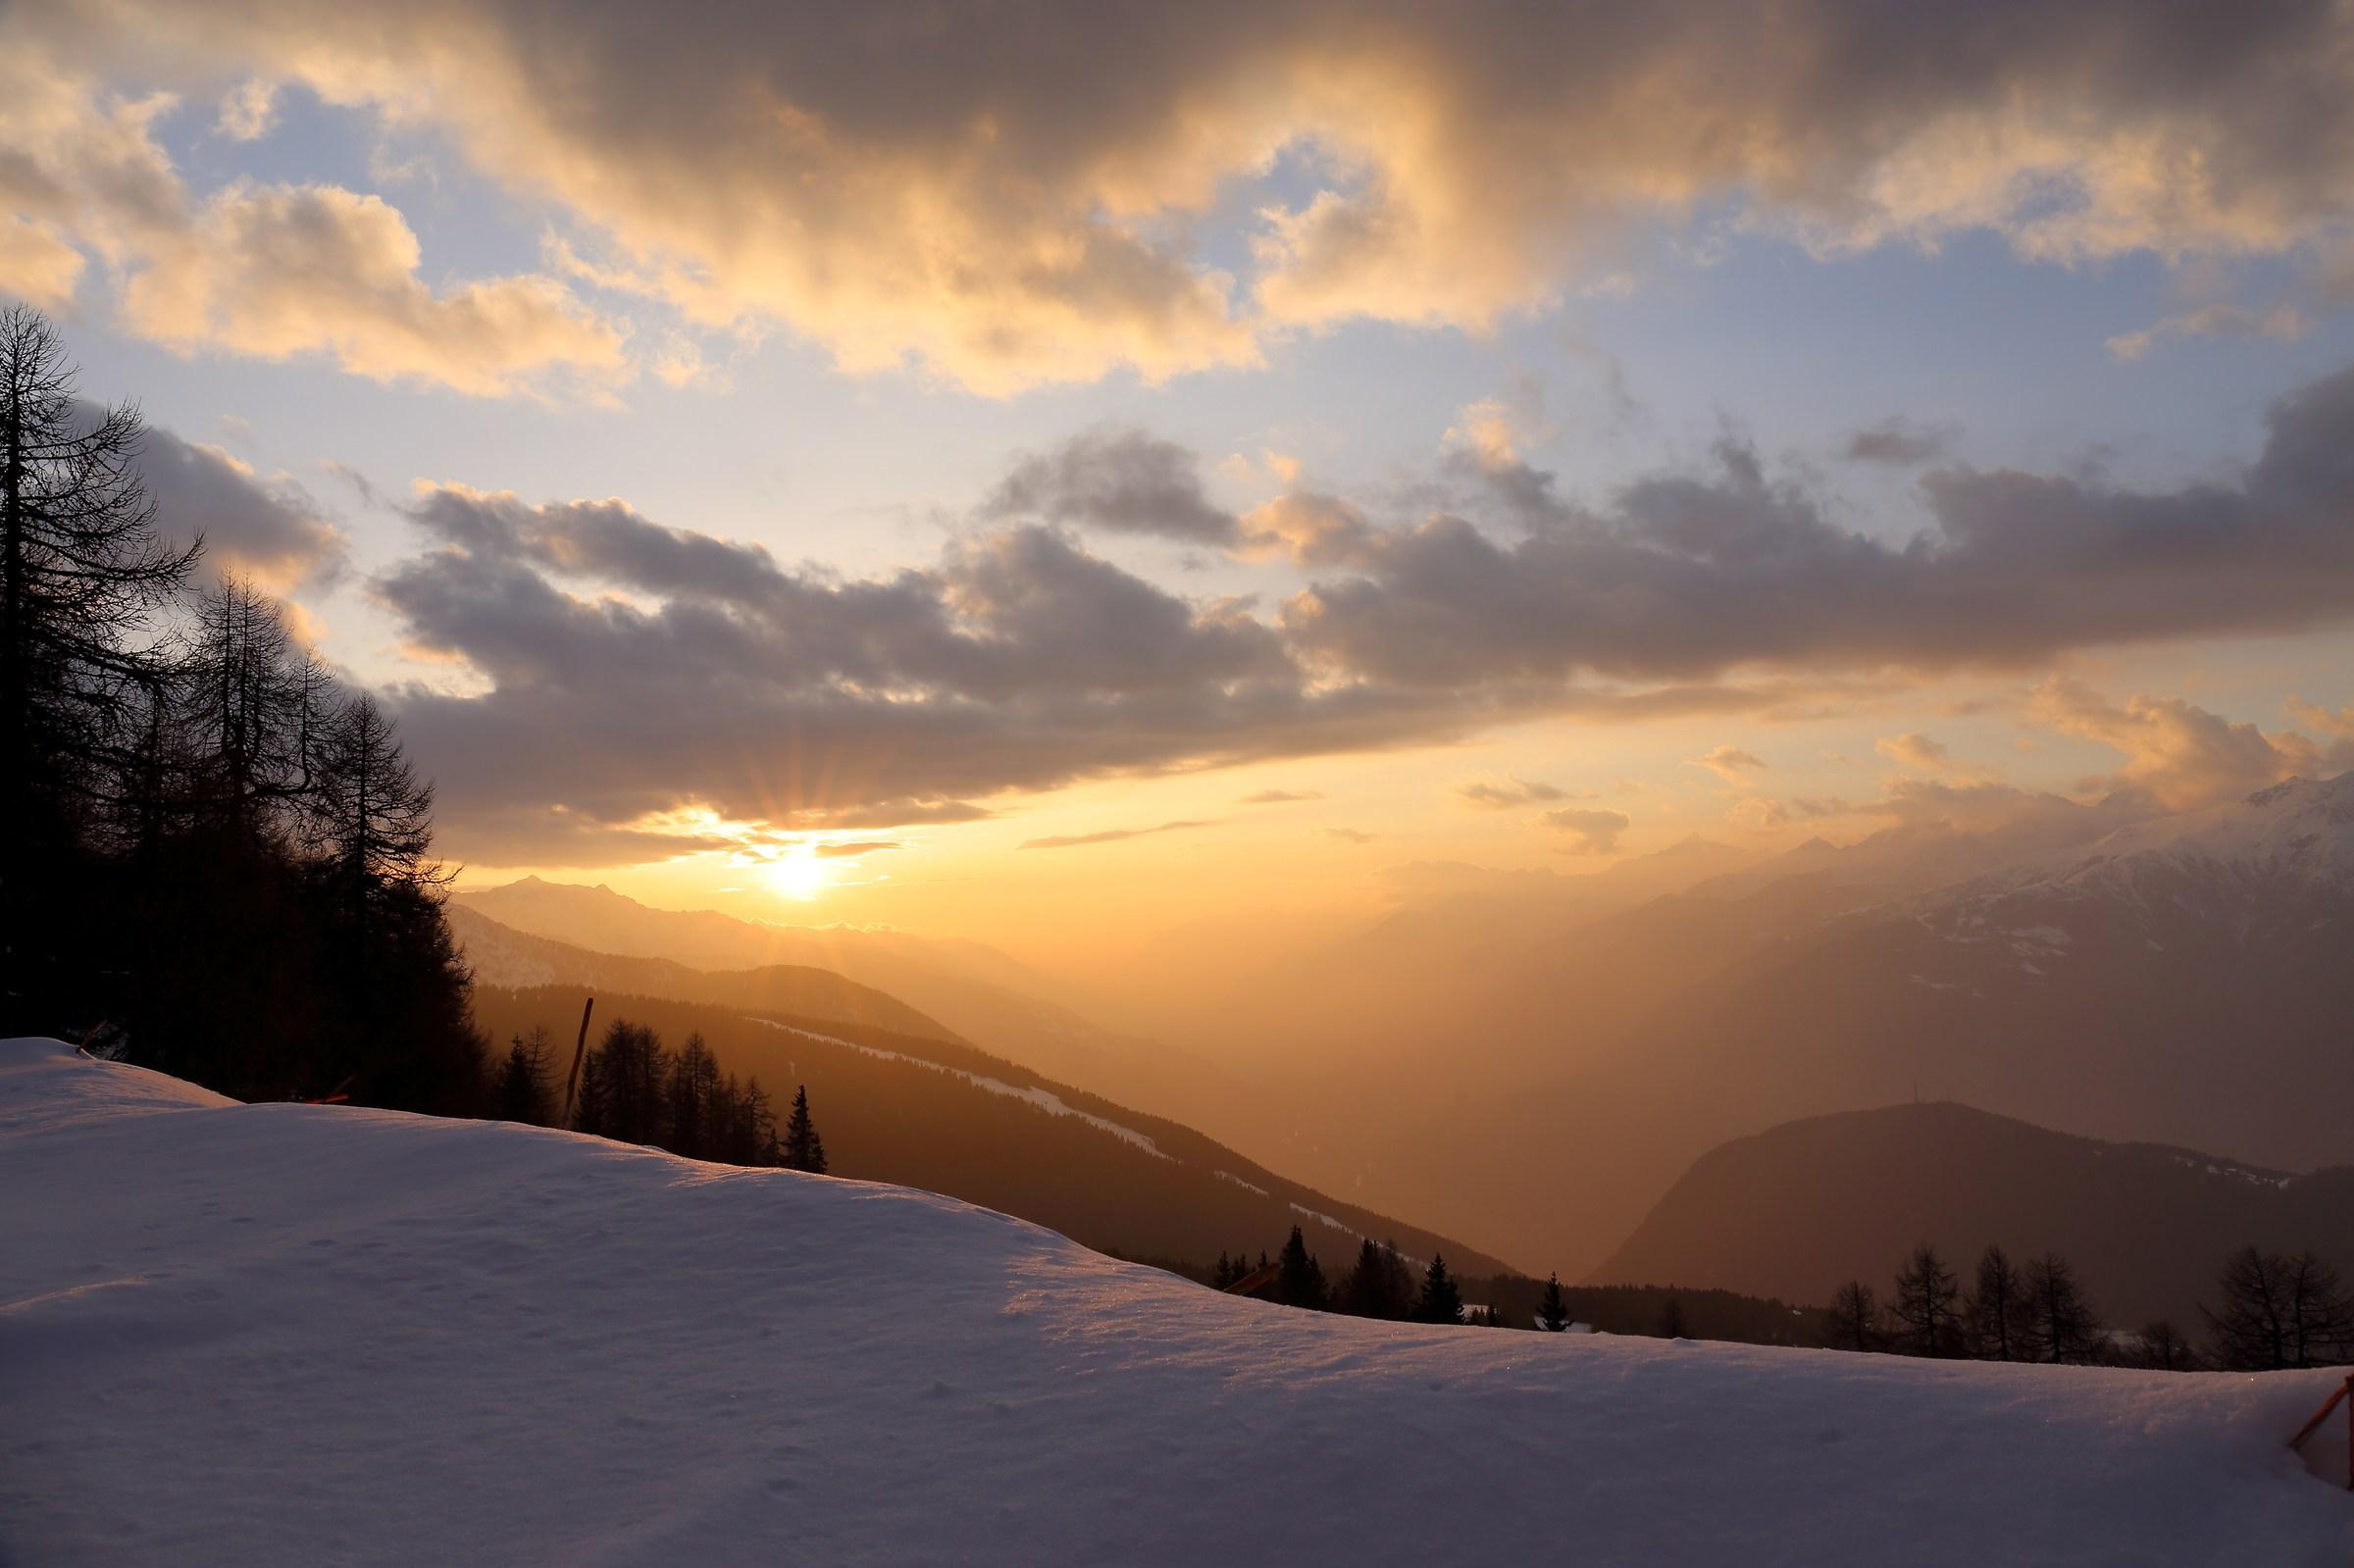 sunset from Baradello 1...